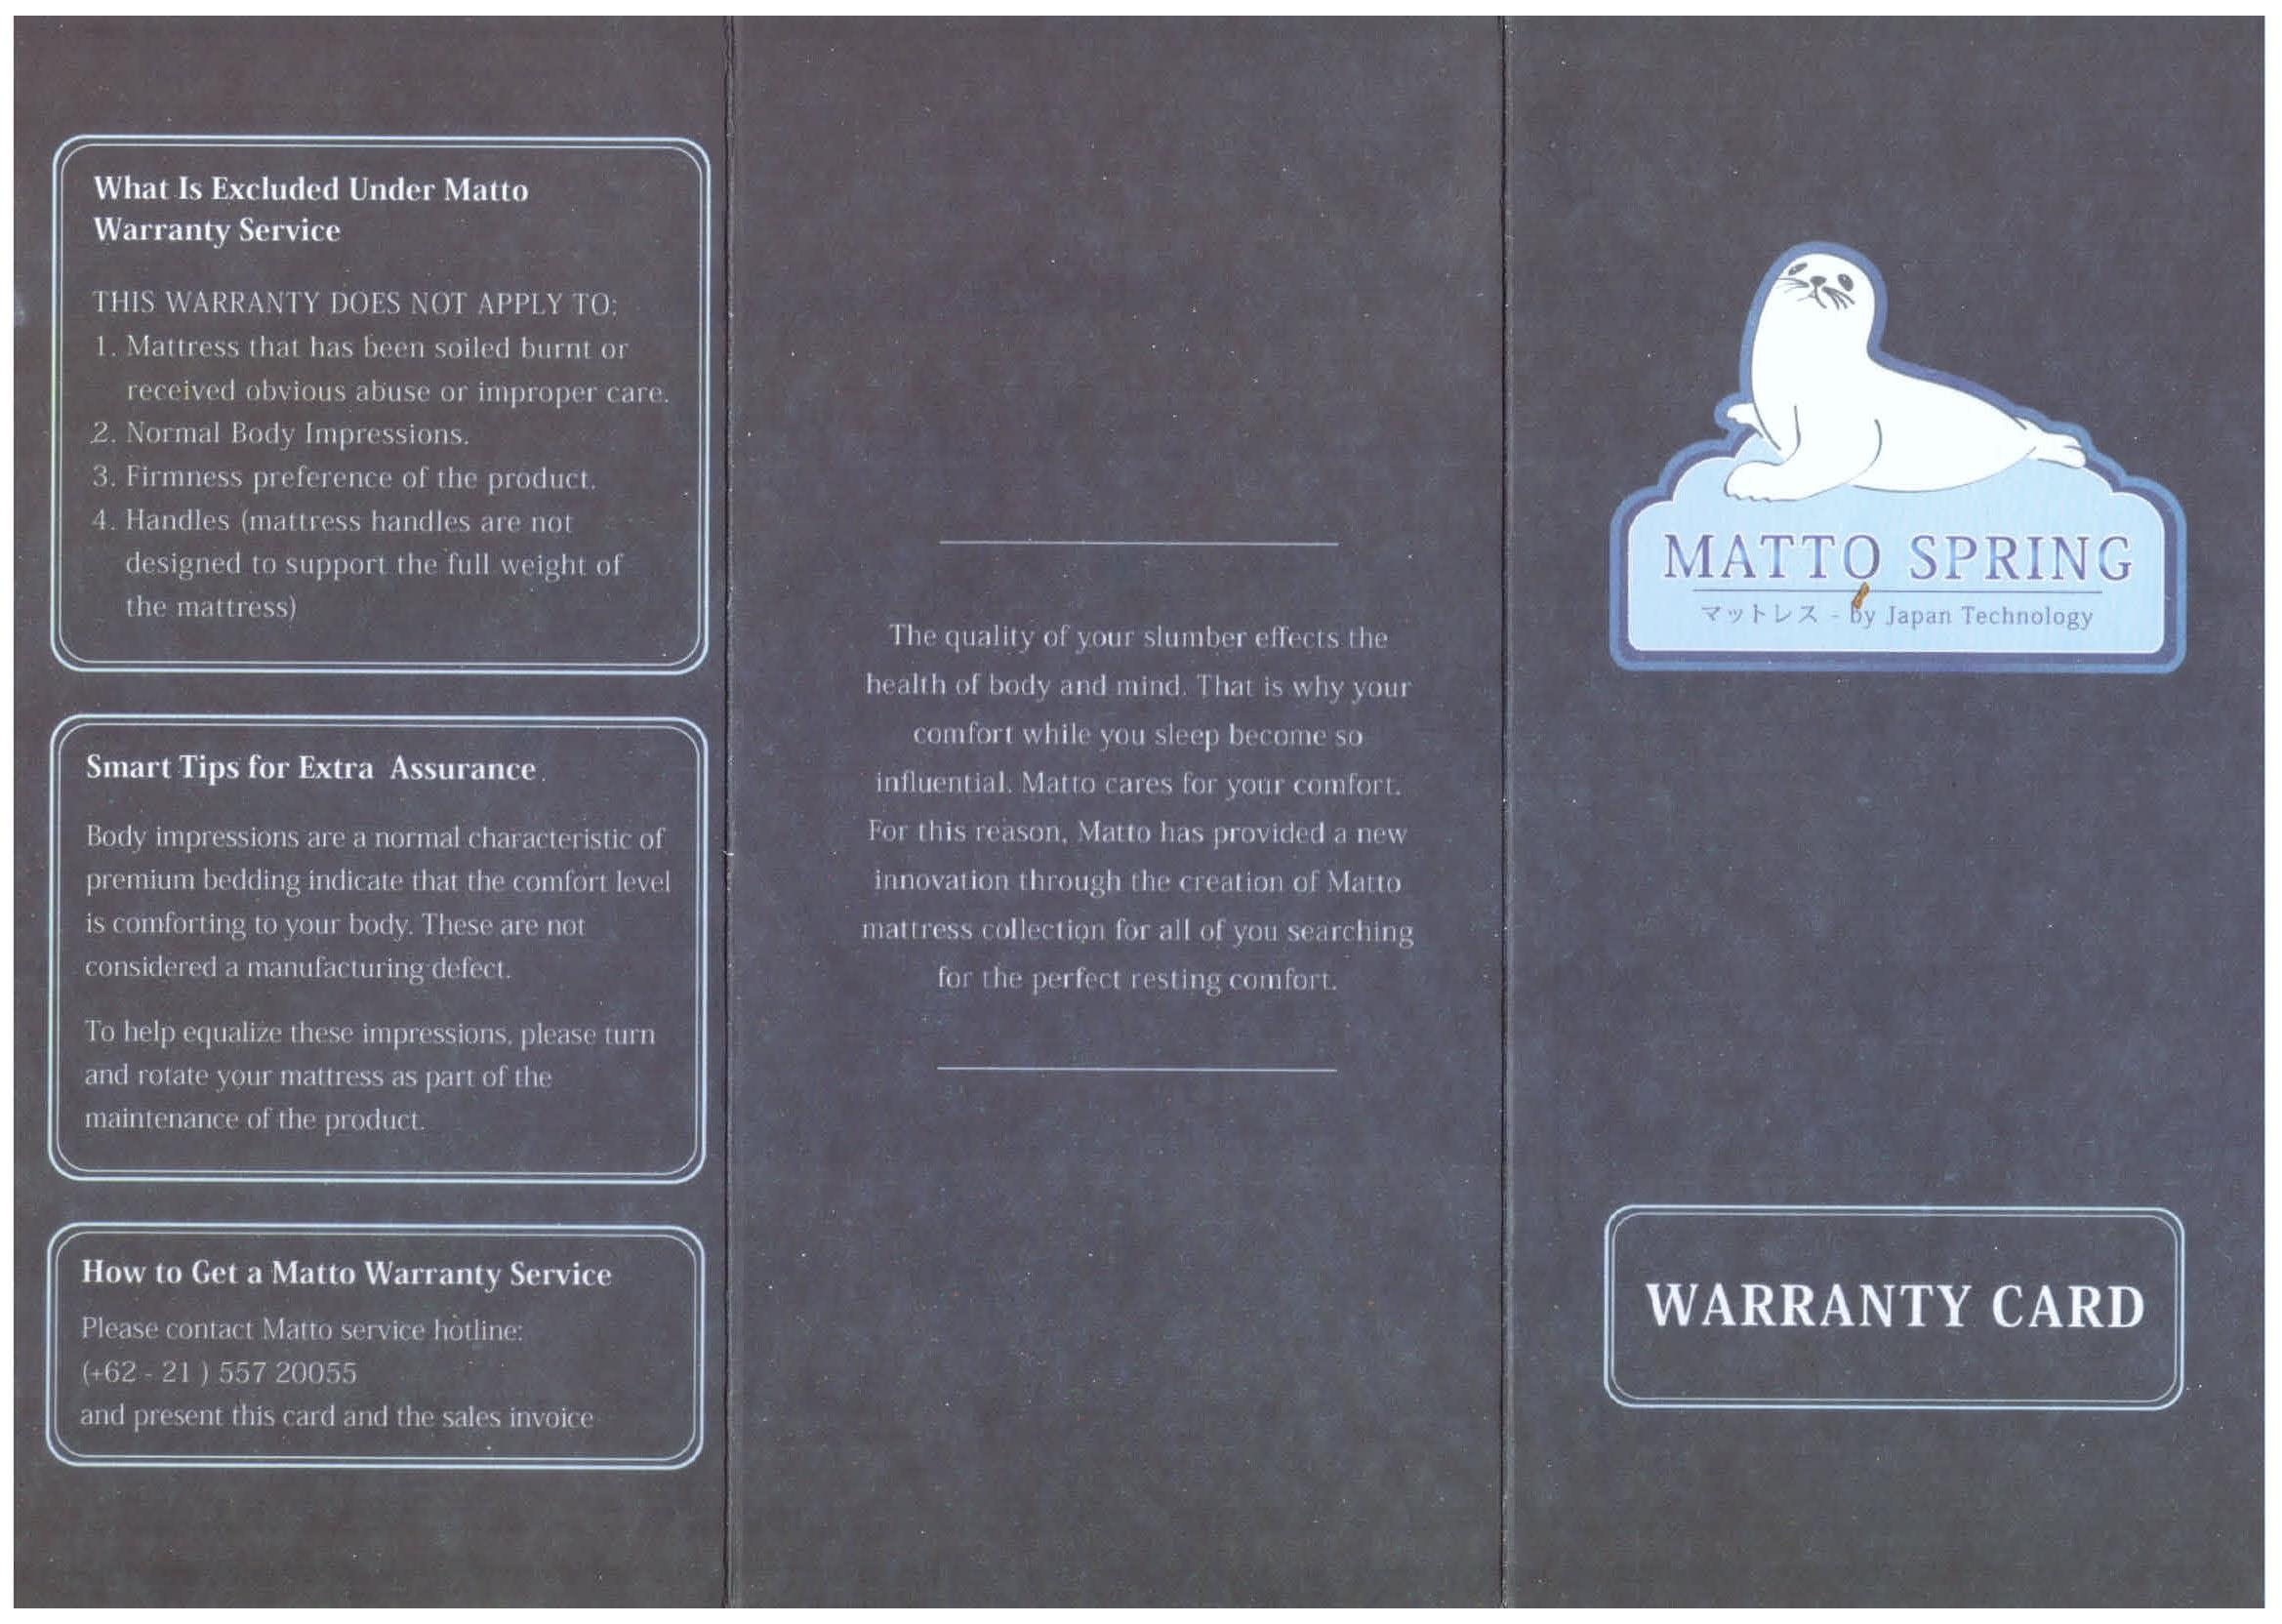 ... Matto Shori Springbed Standard (27 Cm) Biru Size 180 x 200 - Mattress Only